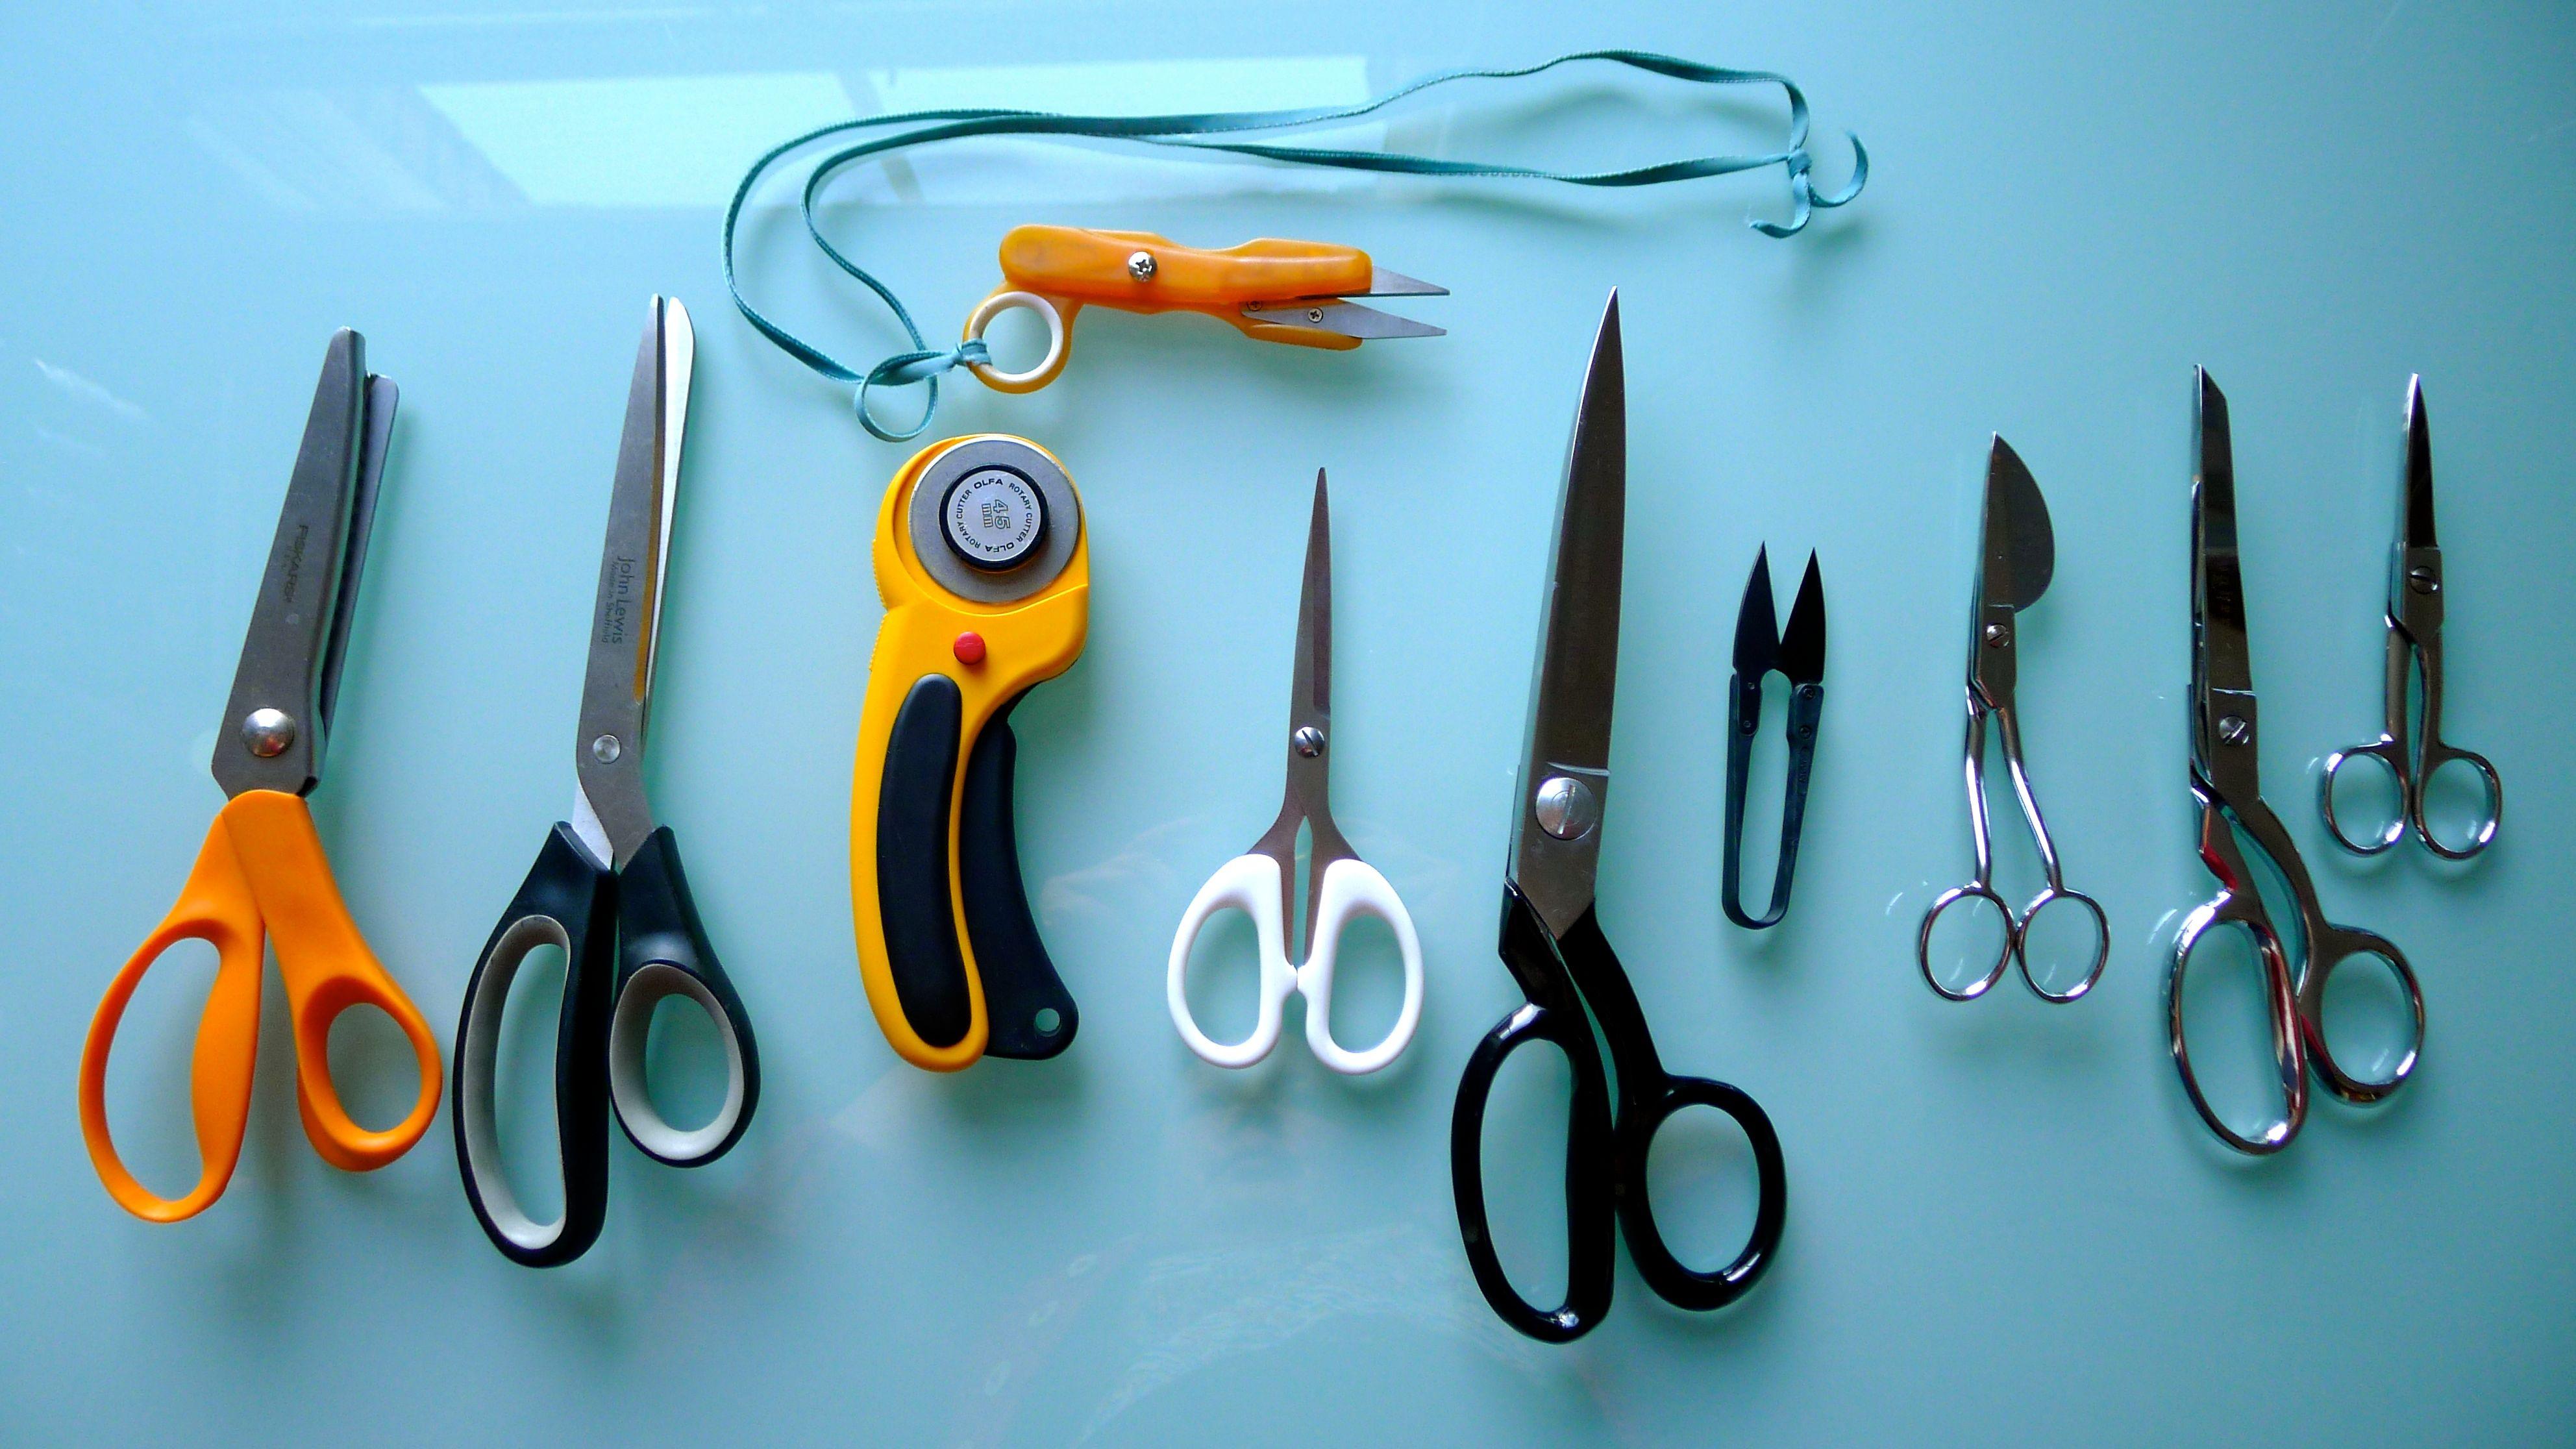 sewing-scissors